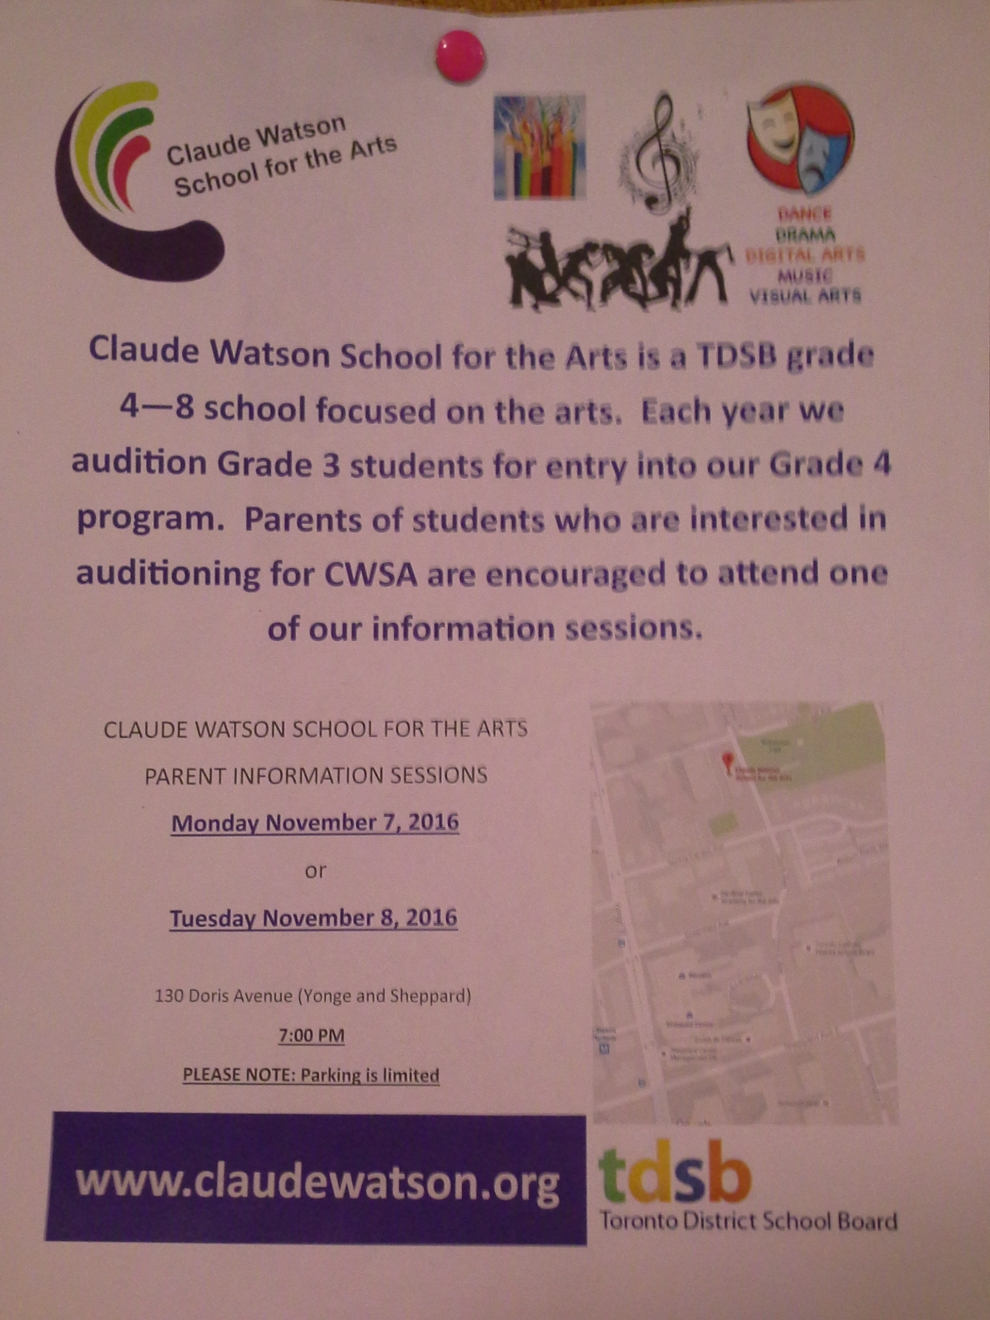 Claude Watson School for the Arts